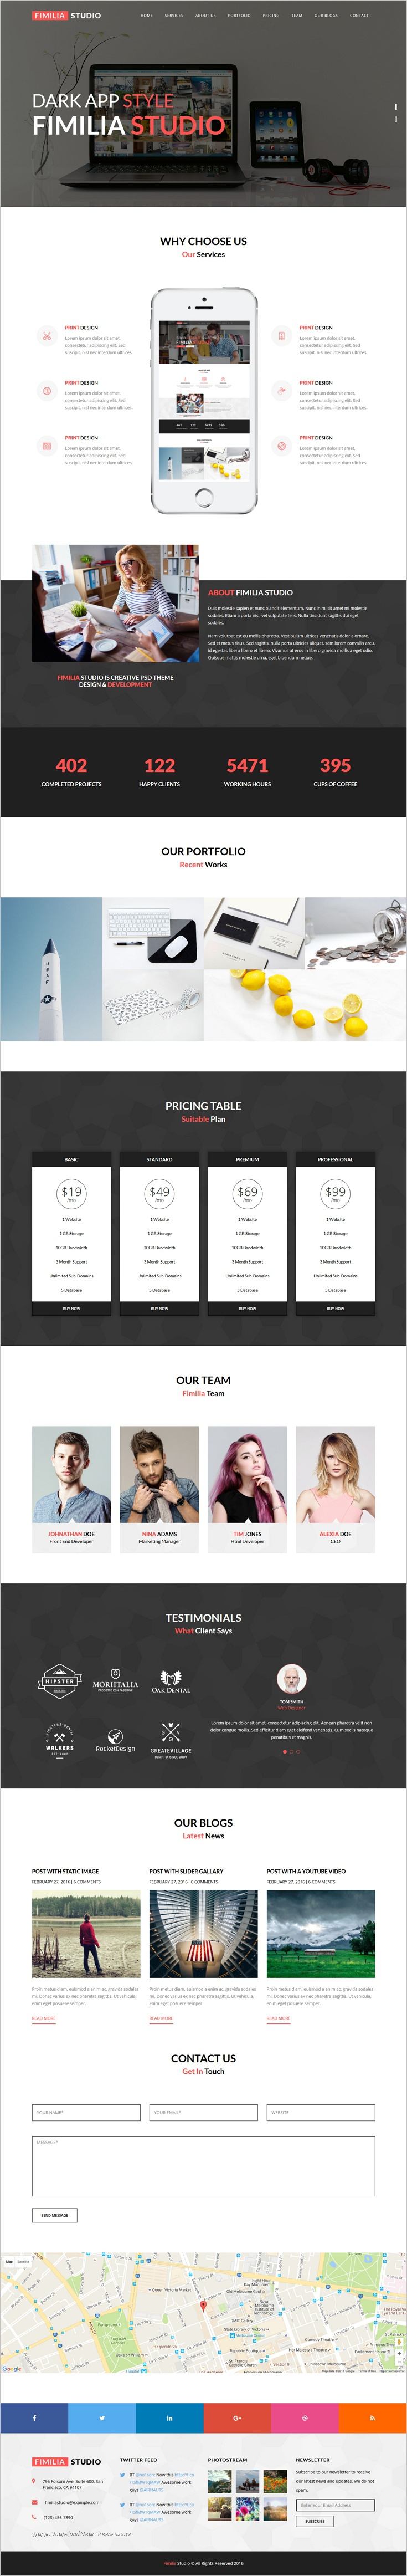 FIMILIA STUDIO - HTML5 Landing Page Template | Personal portfolio ...